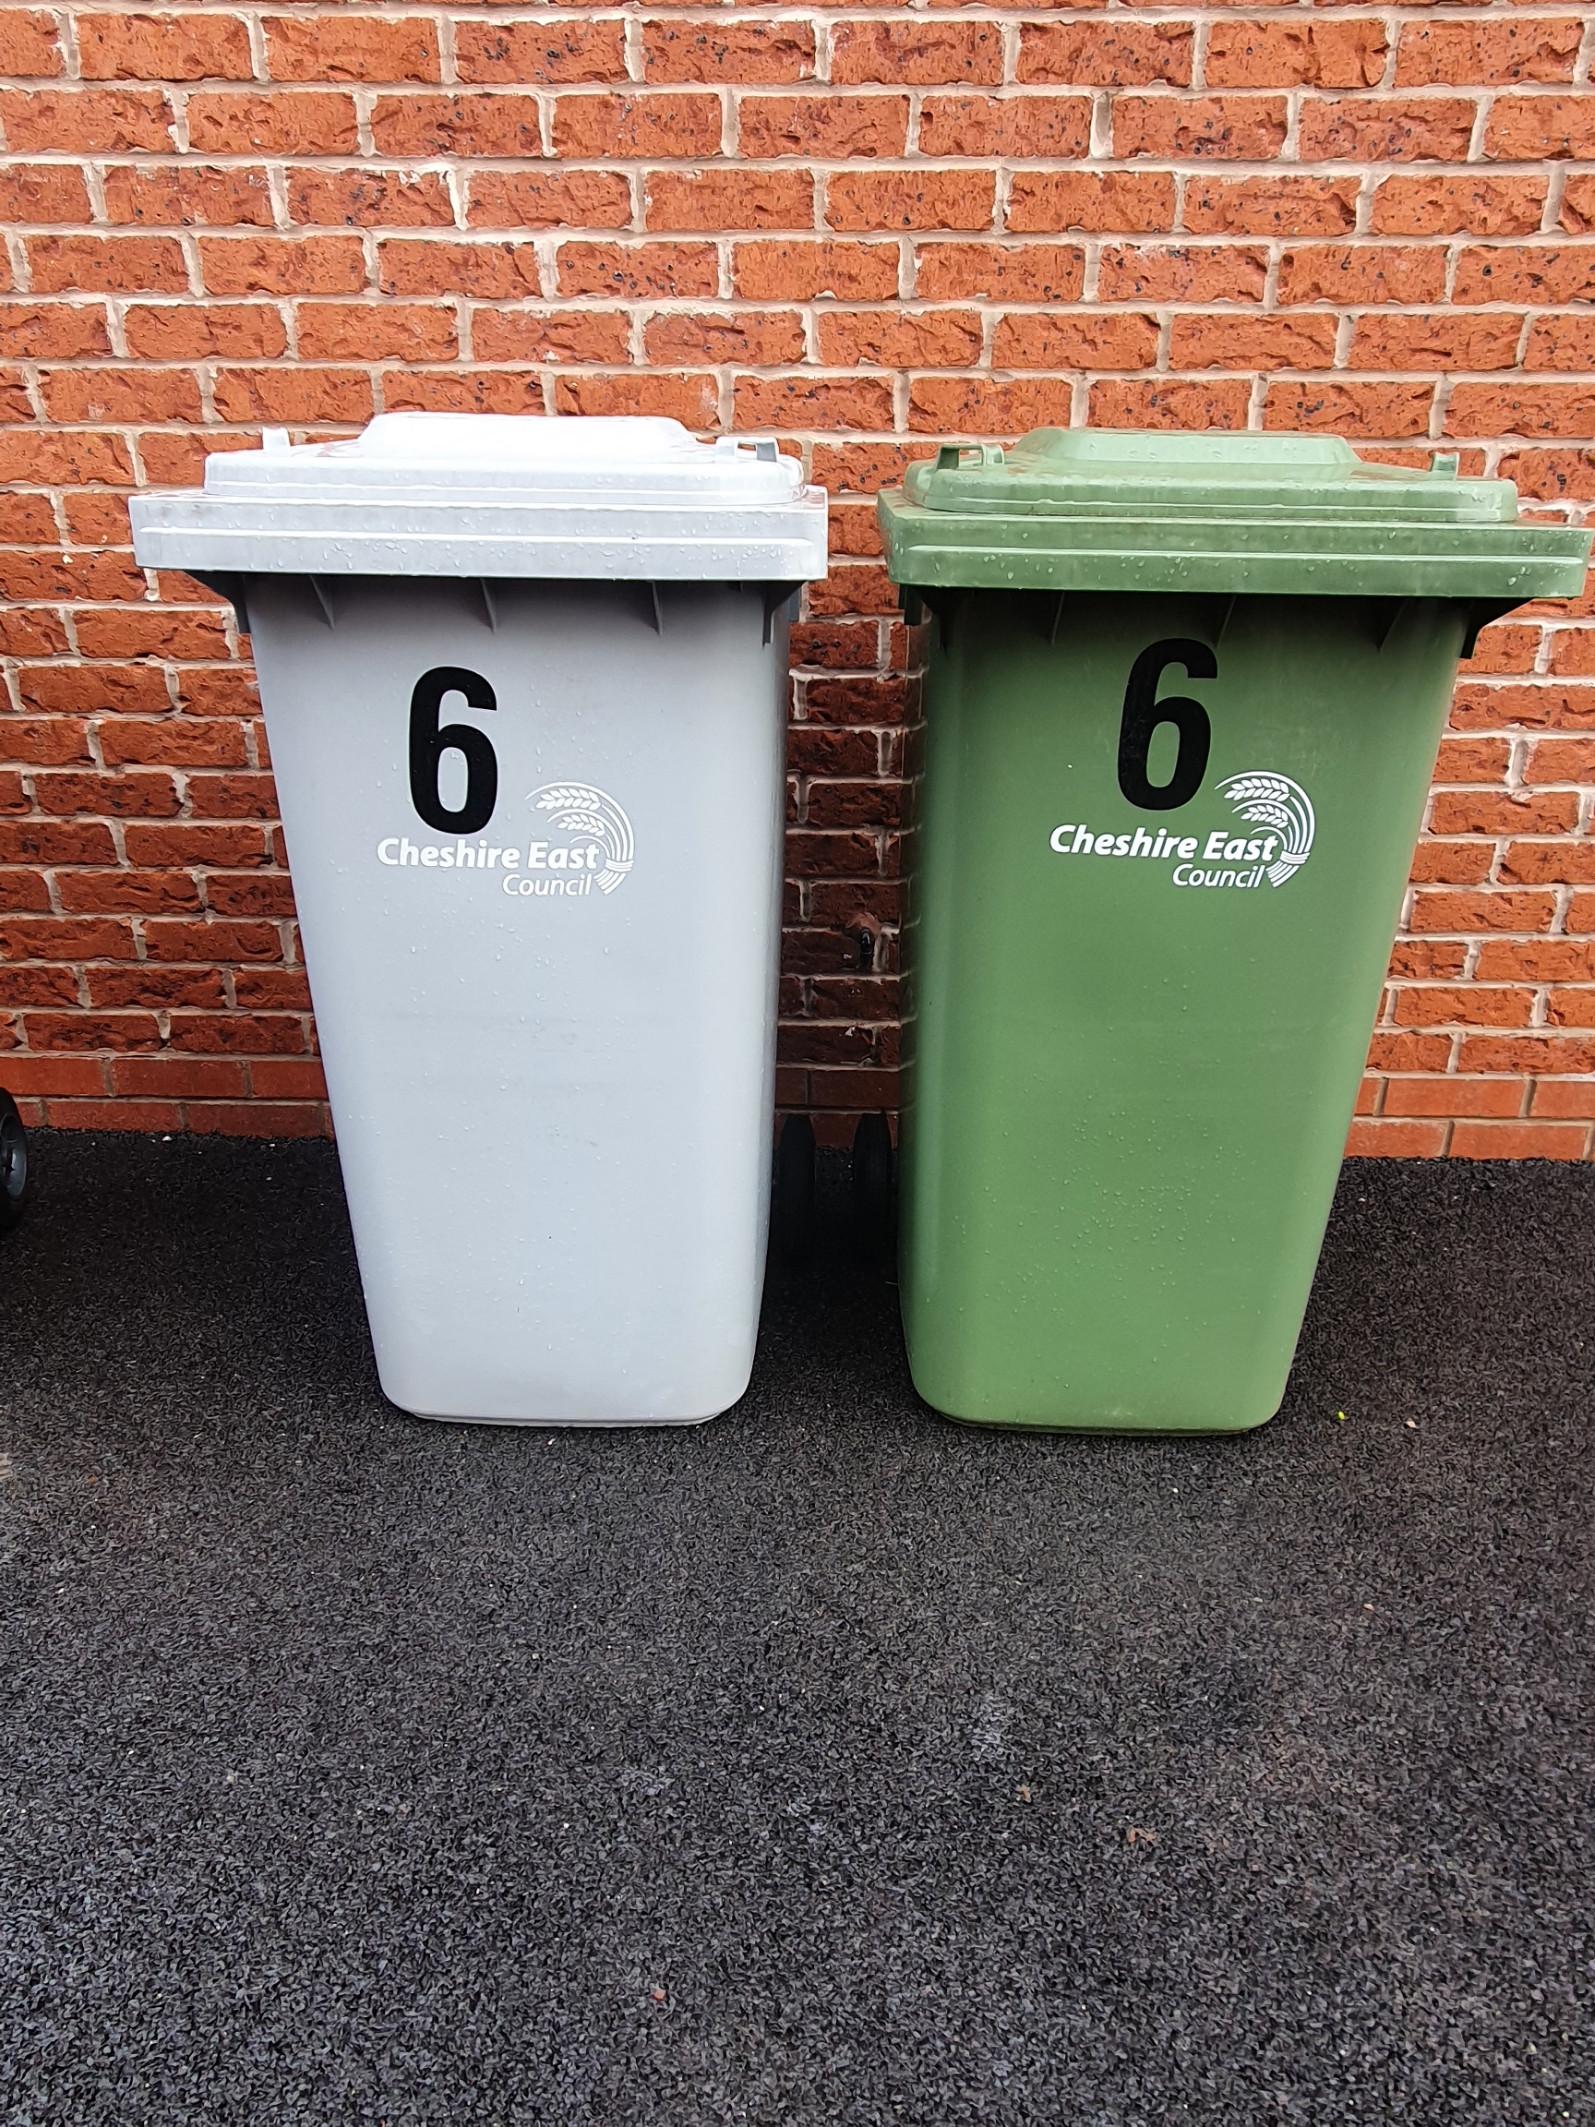 Green & Grey bin clean 4 weekly £8.50